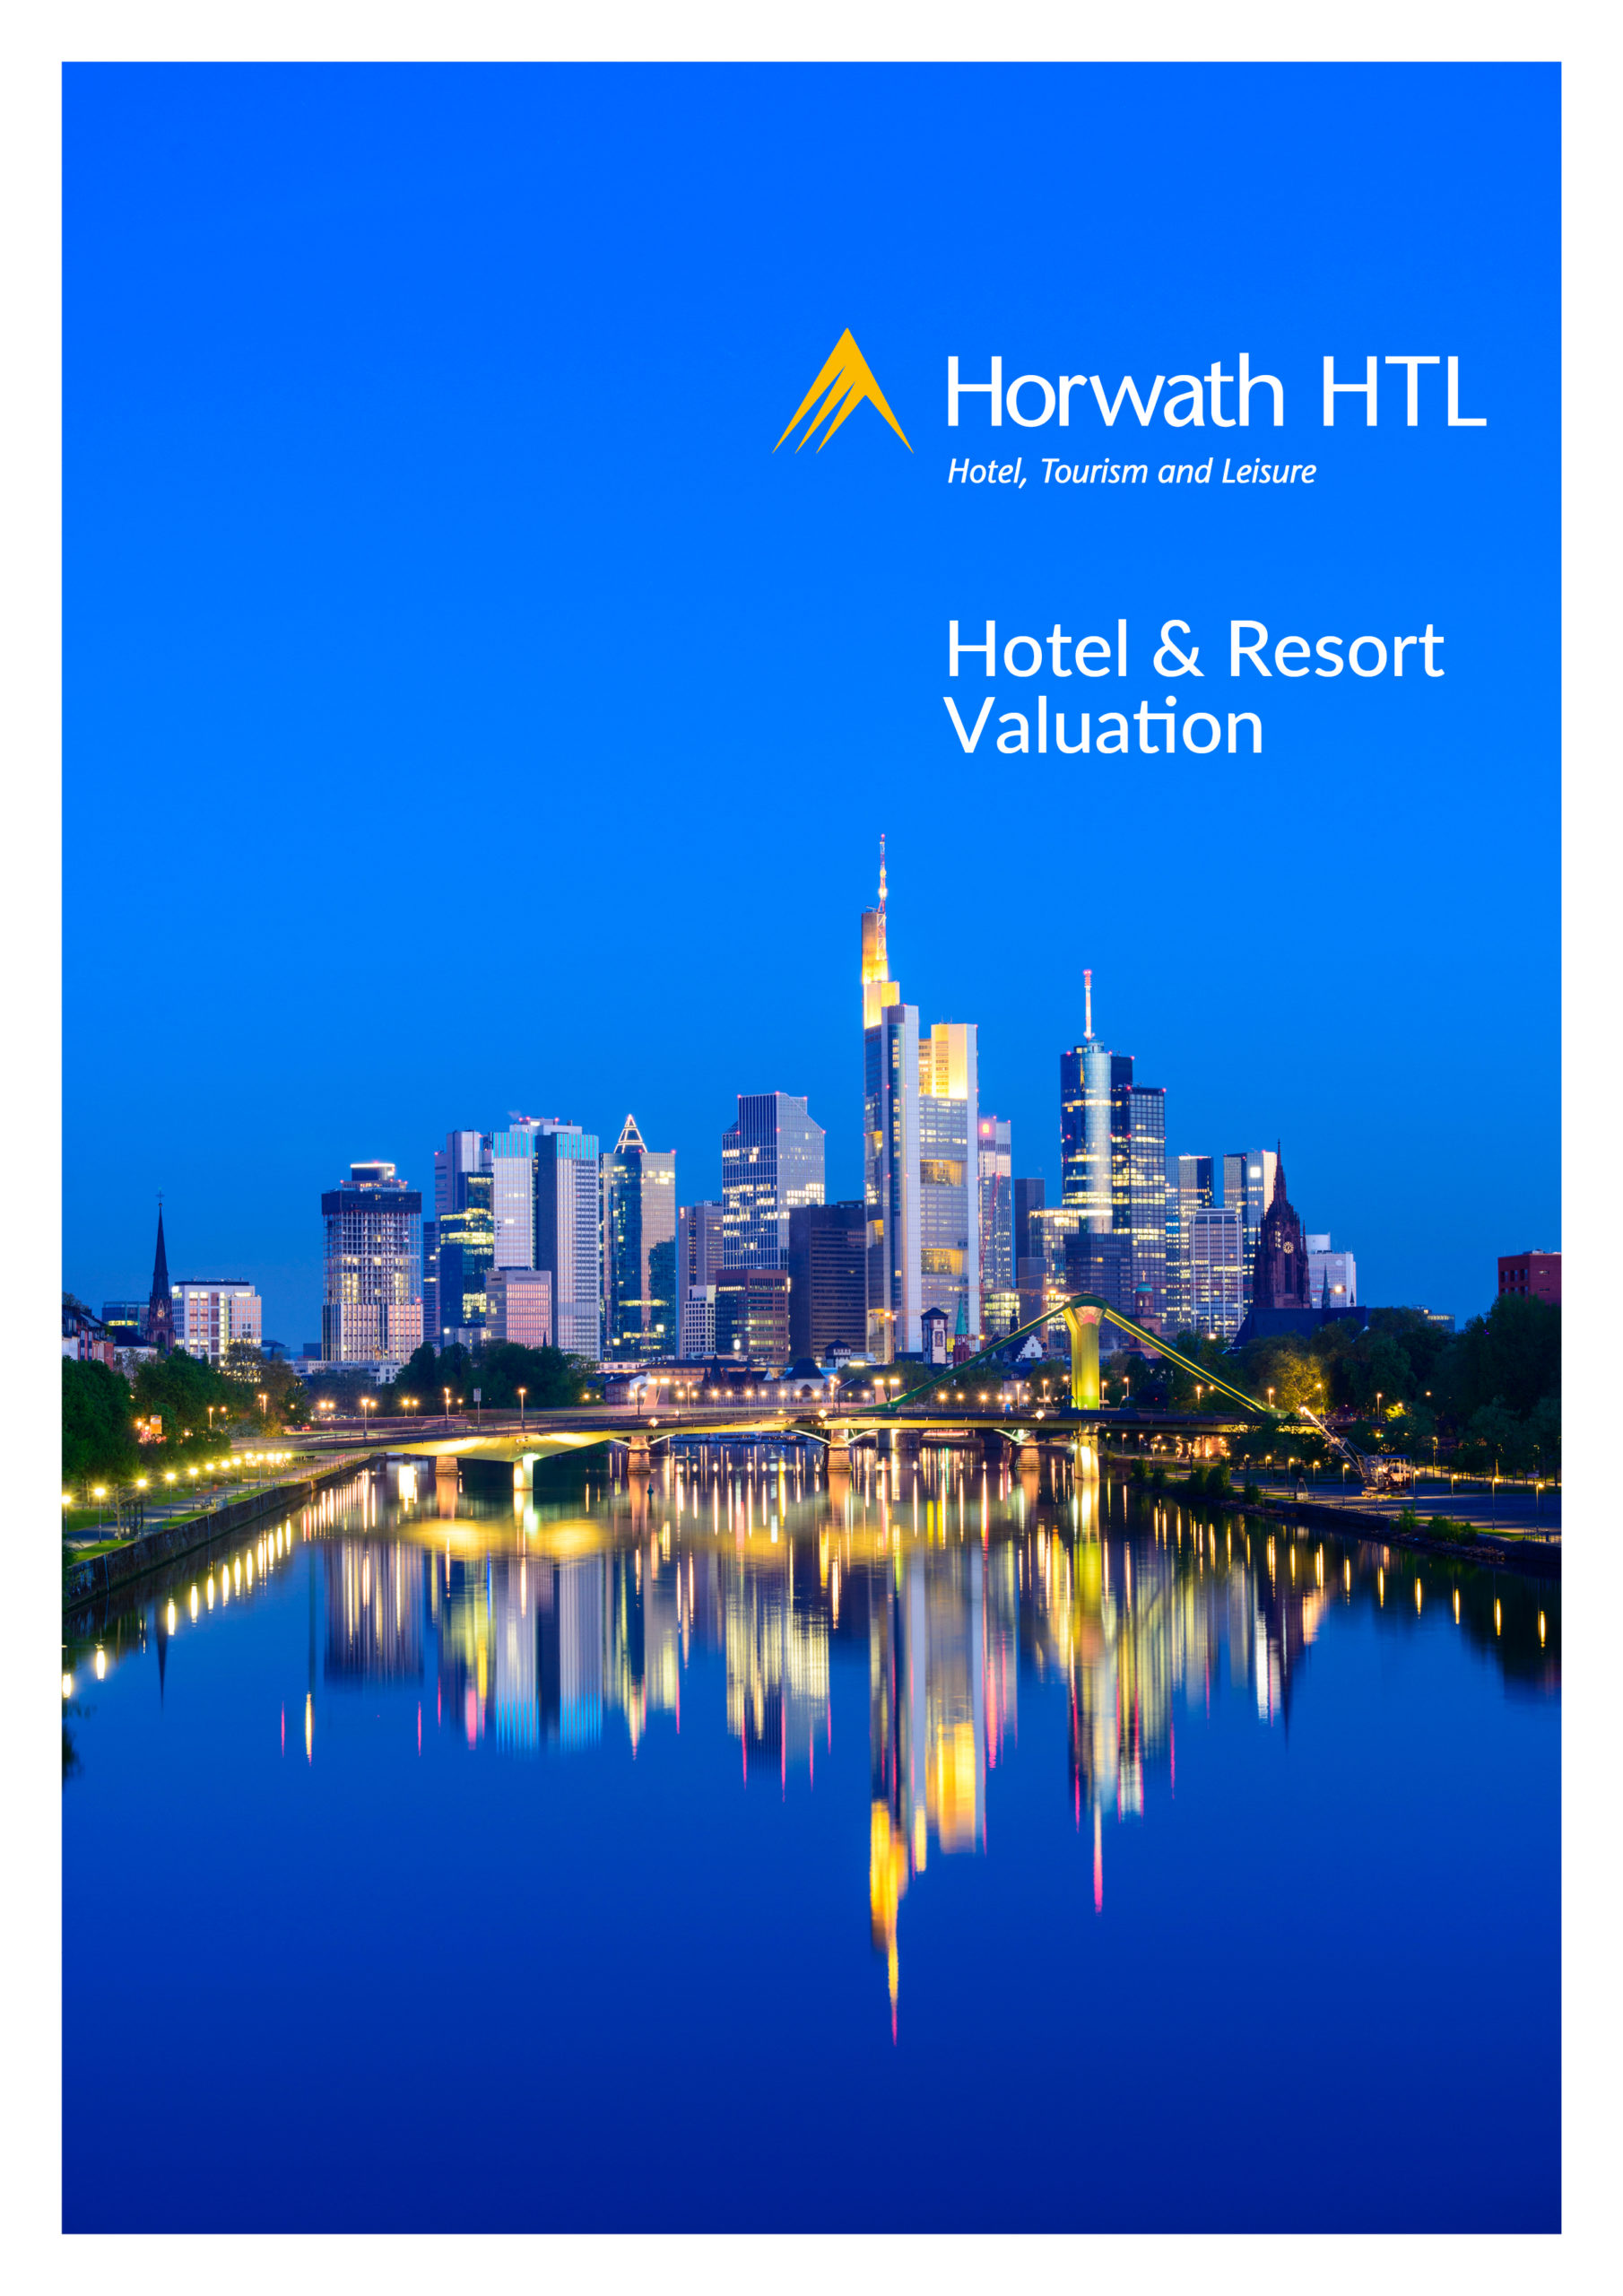 Hotel & Resort Valuation